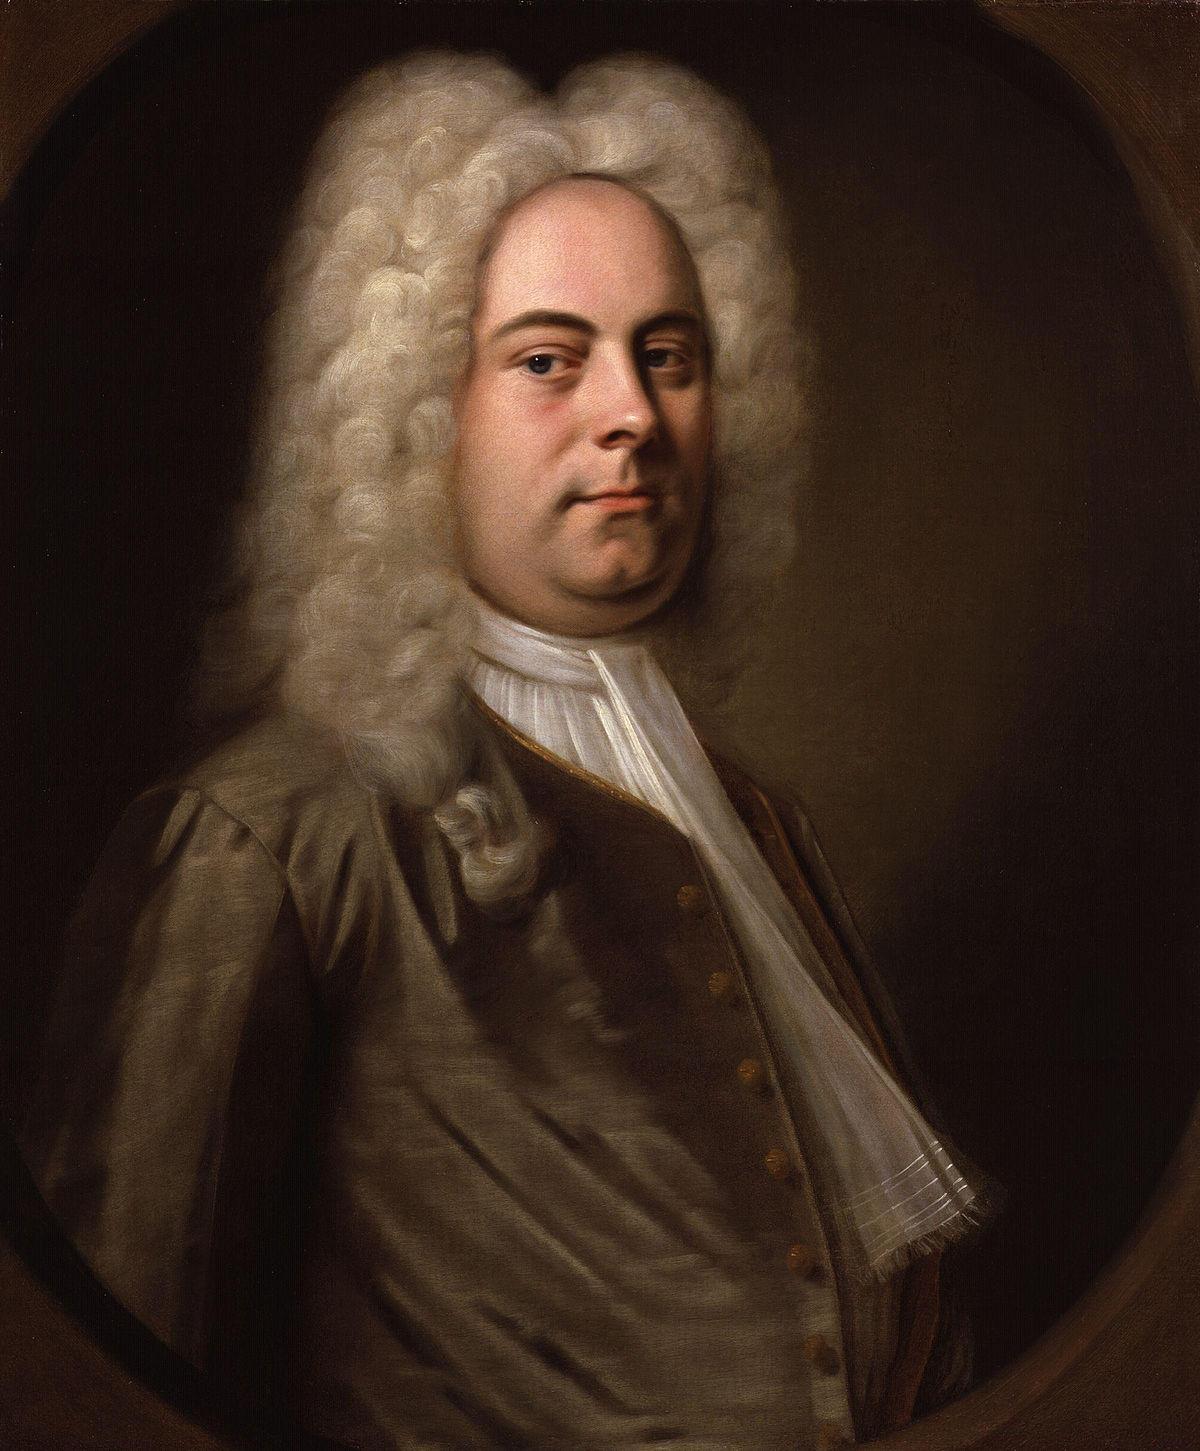 1200px-George_Frideric_Handel_by_Balthasar_Denner.jpg